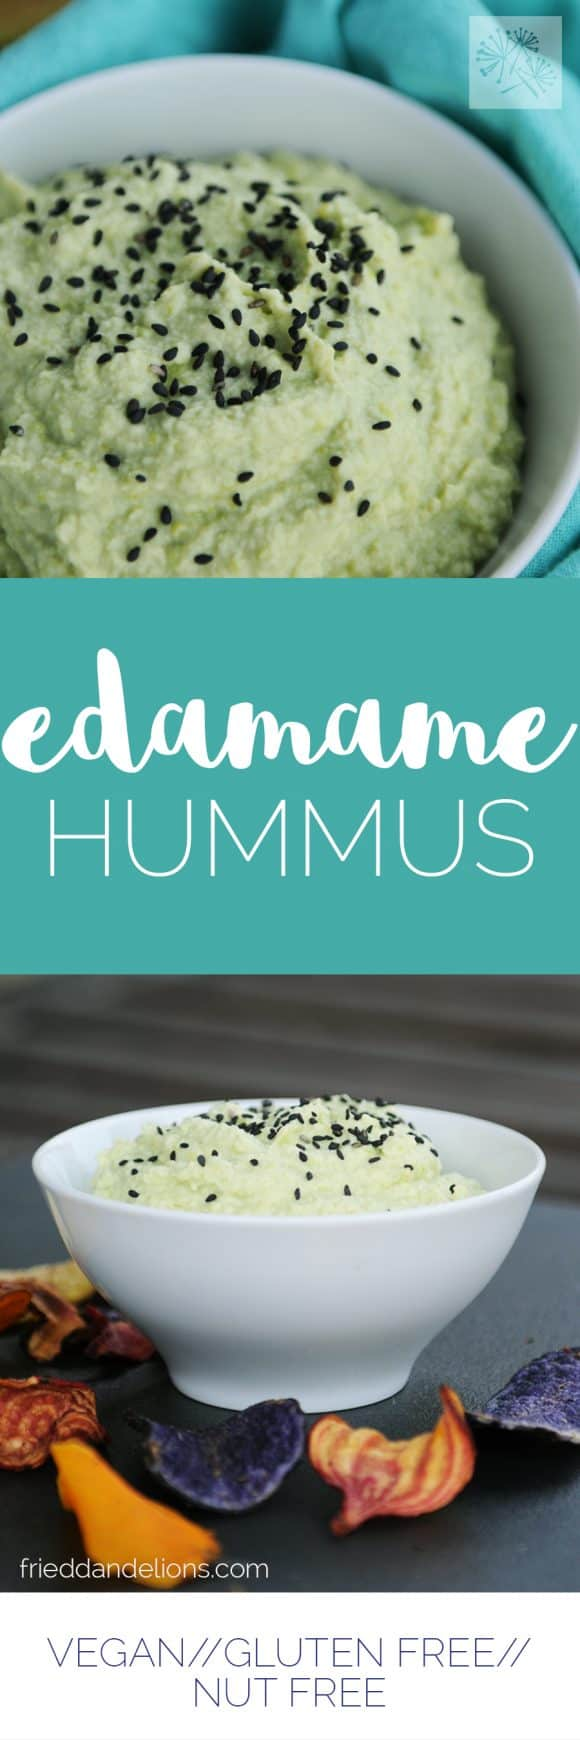 fried dandelions // edamame hummus